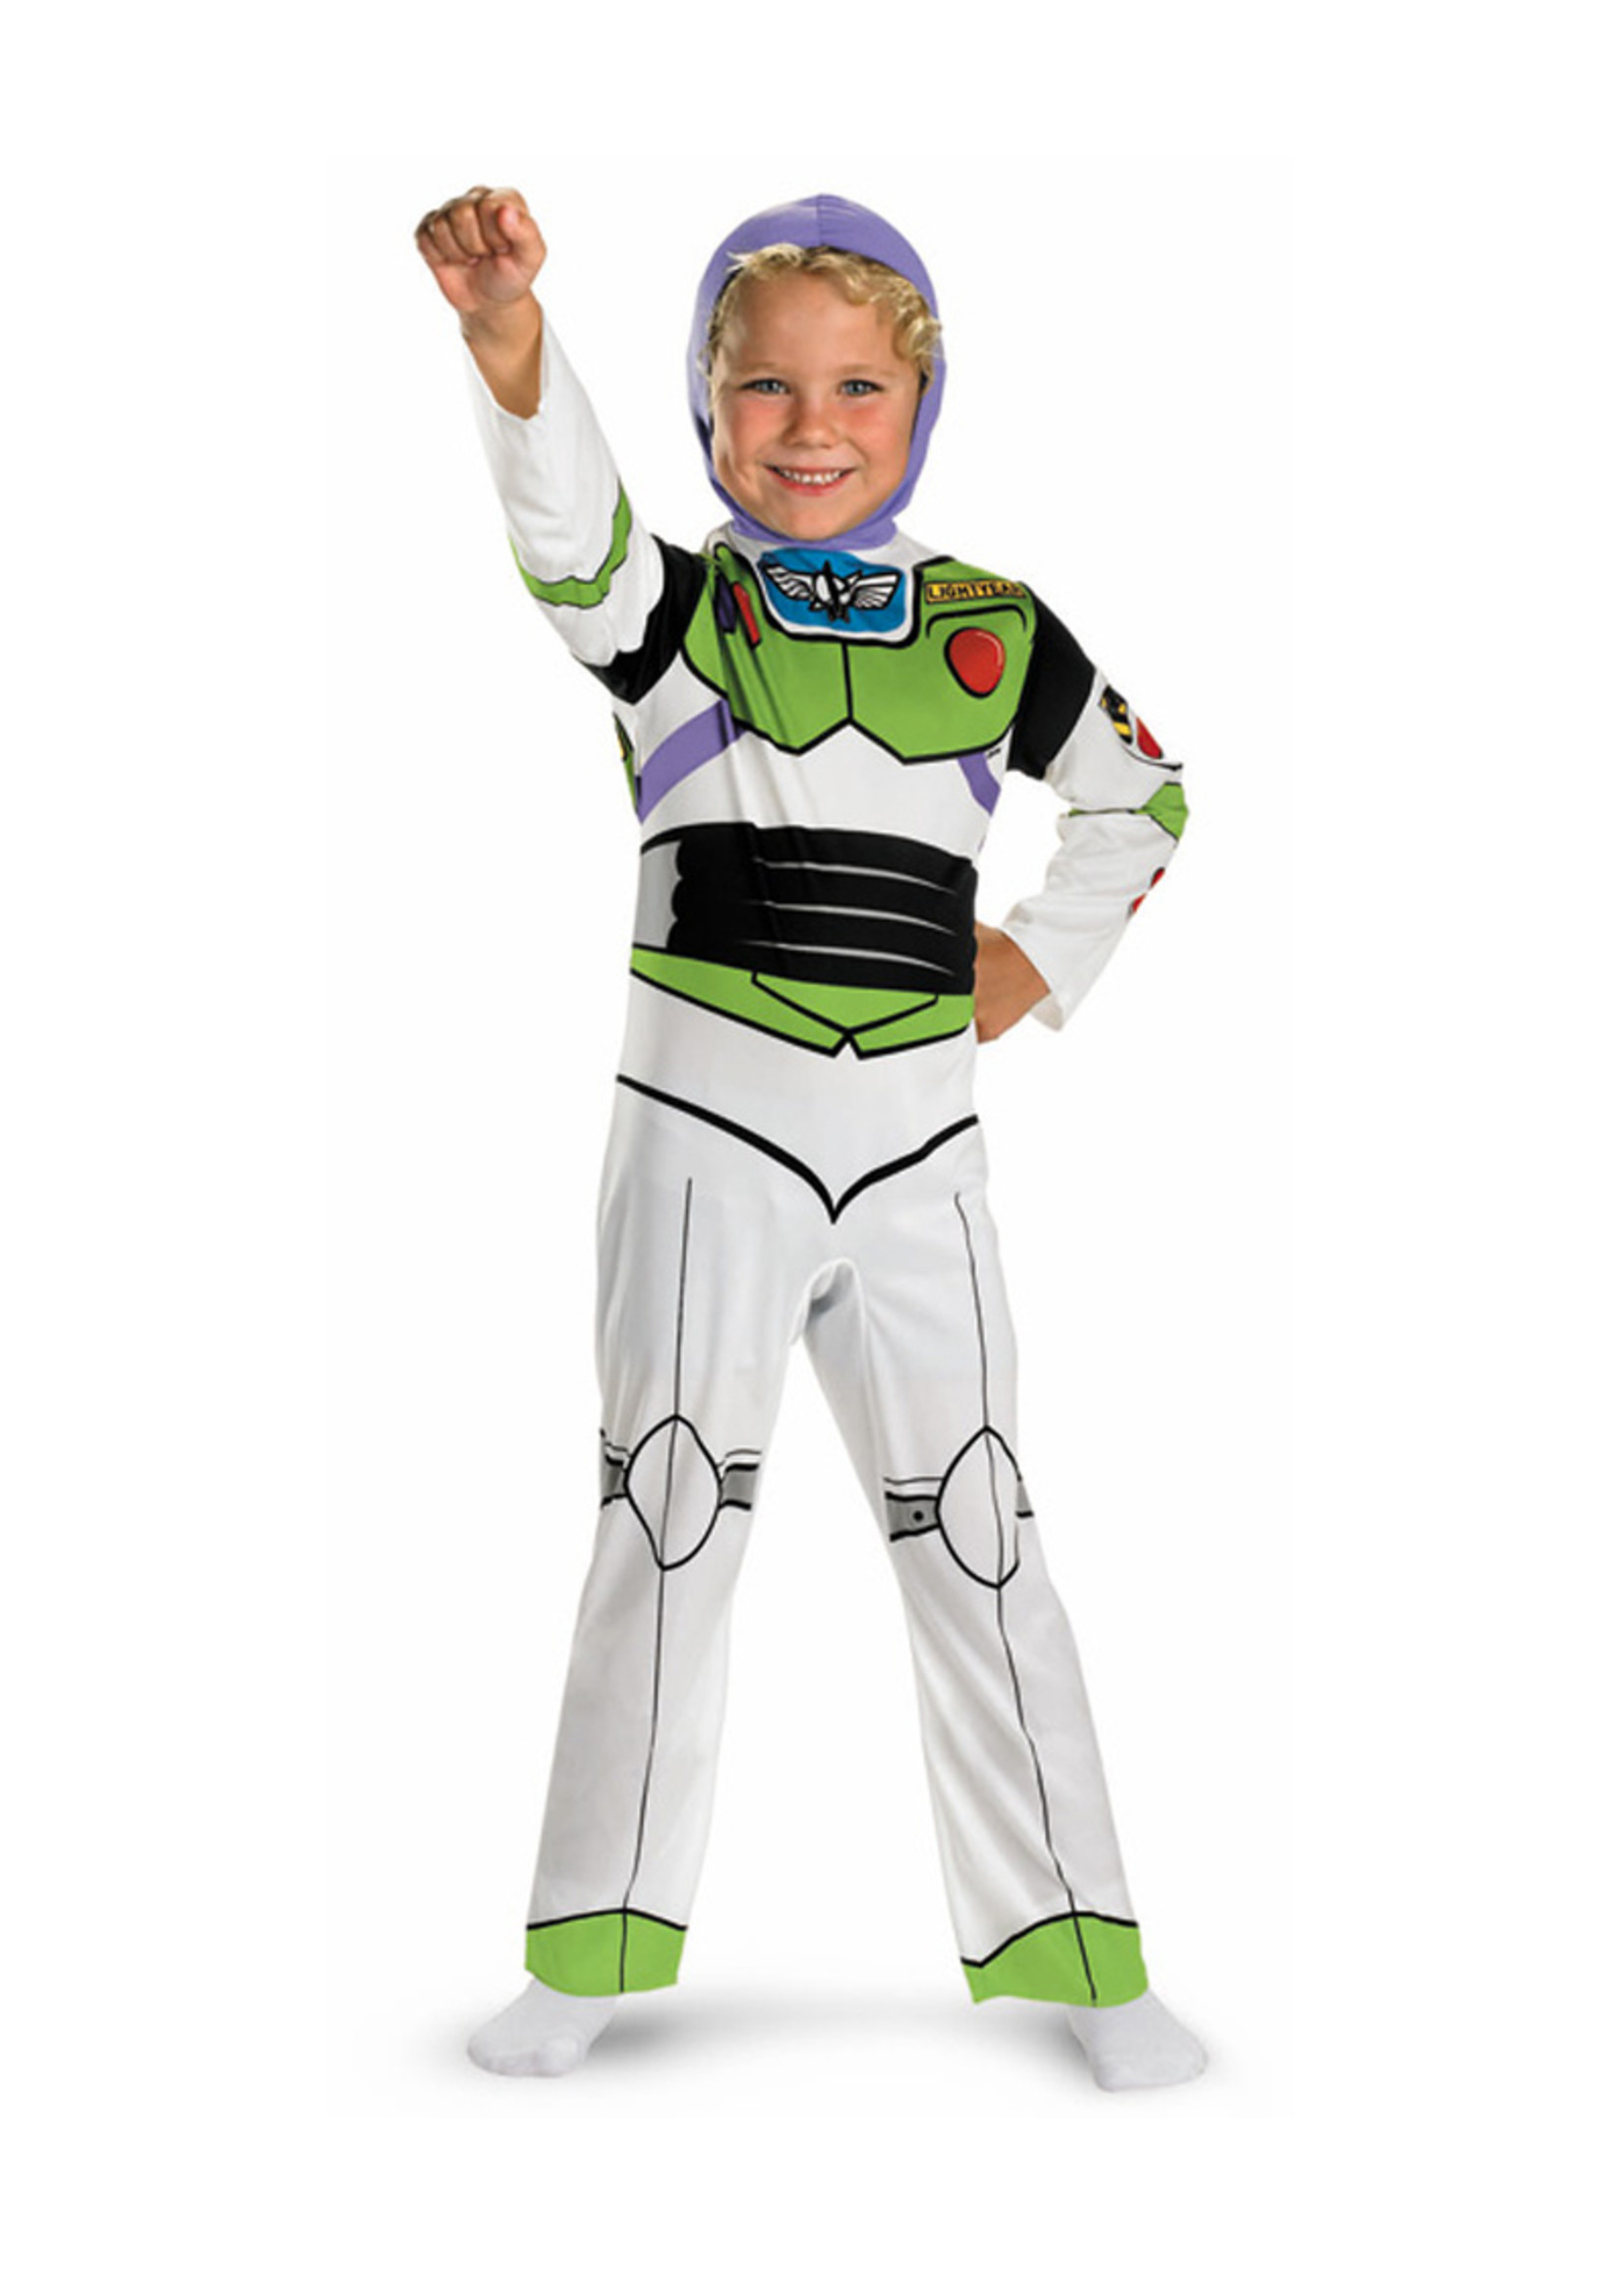 Buzz Lightyear Costume - Boys